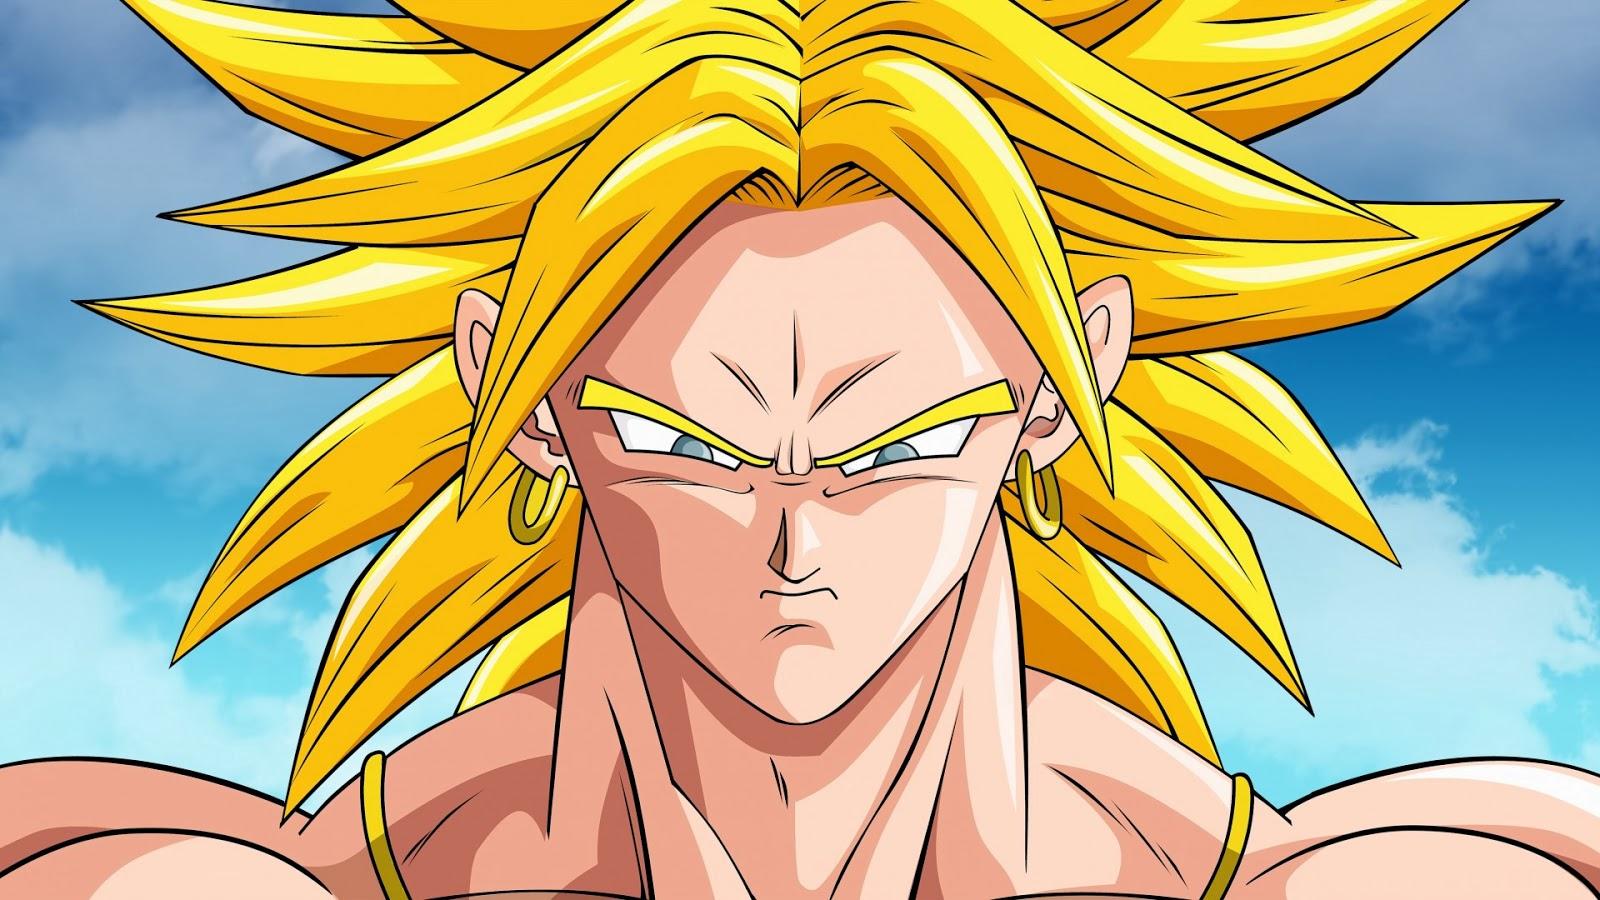 Dragon ball gt senhor todo poderoso rei yaka yaka yaka ludo - 1 7